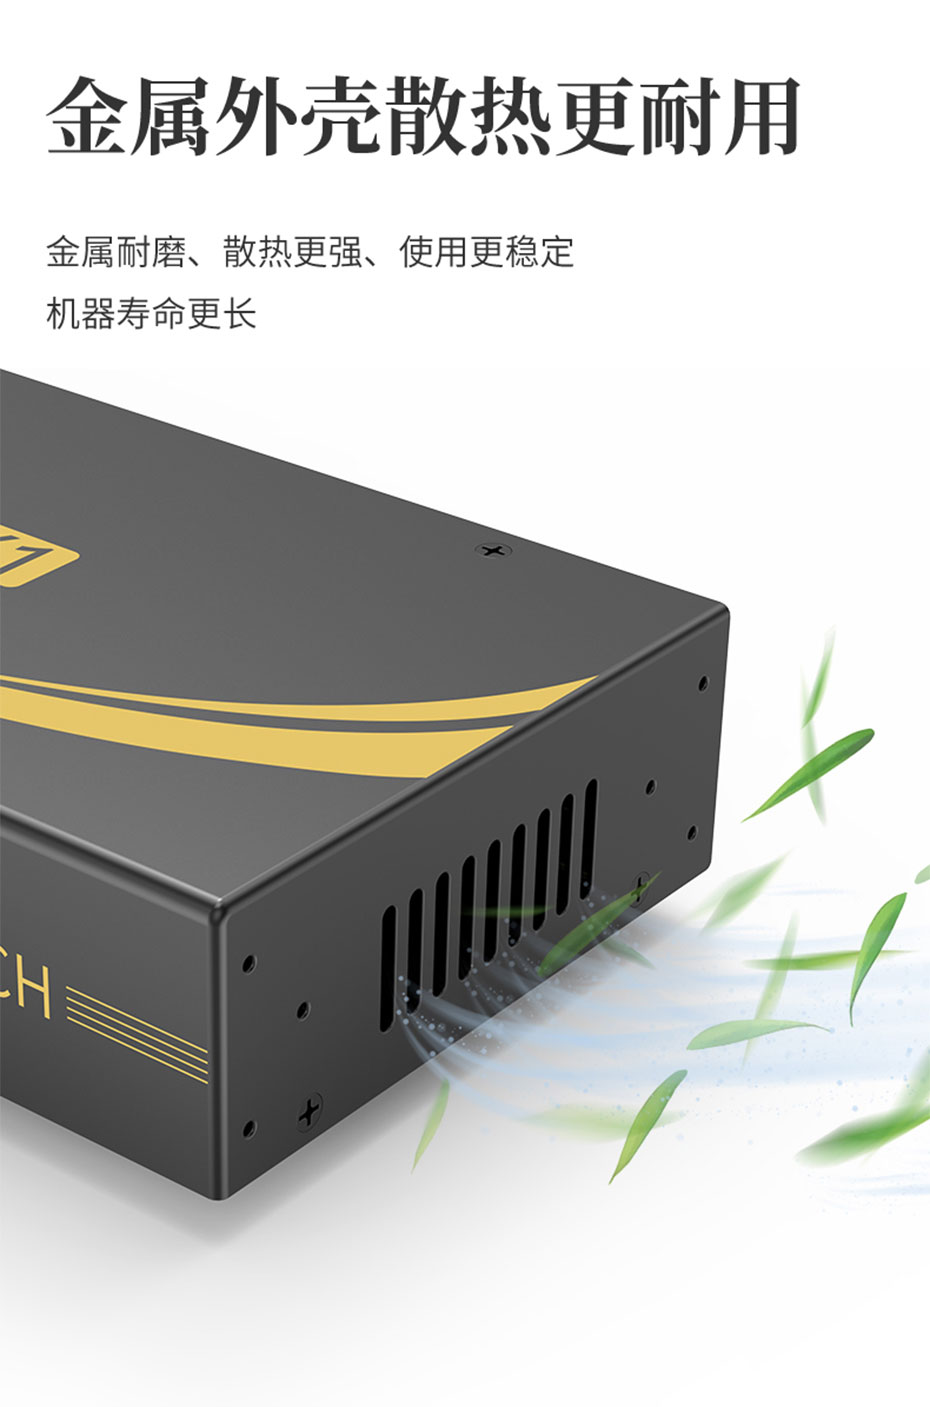 HDMI KVM切换器8进1出81HK采用全金属机身设计,结实耐用易散热